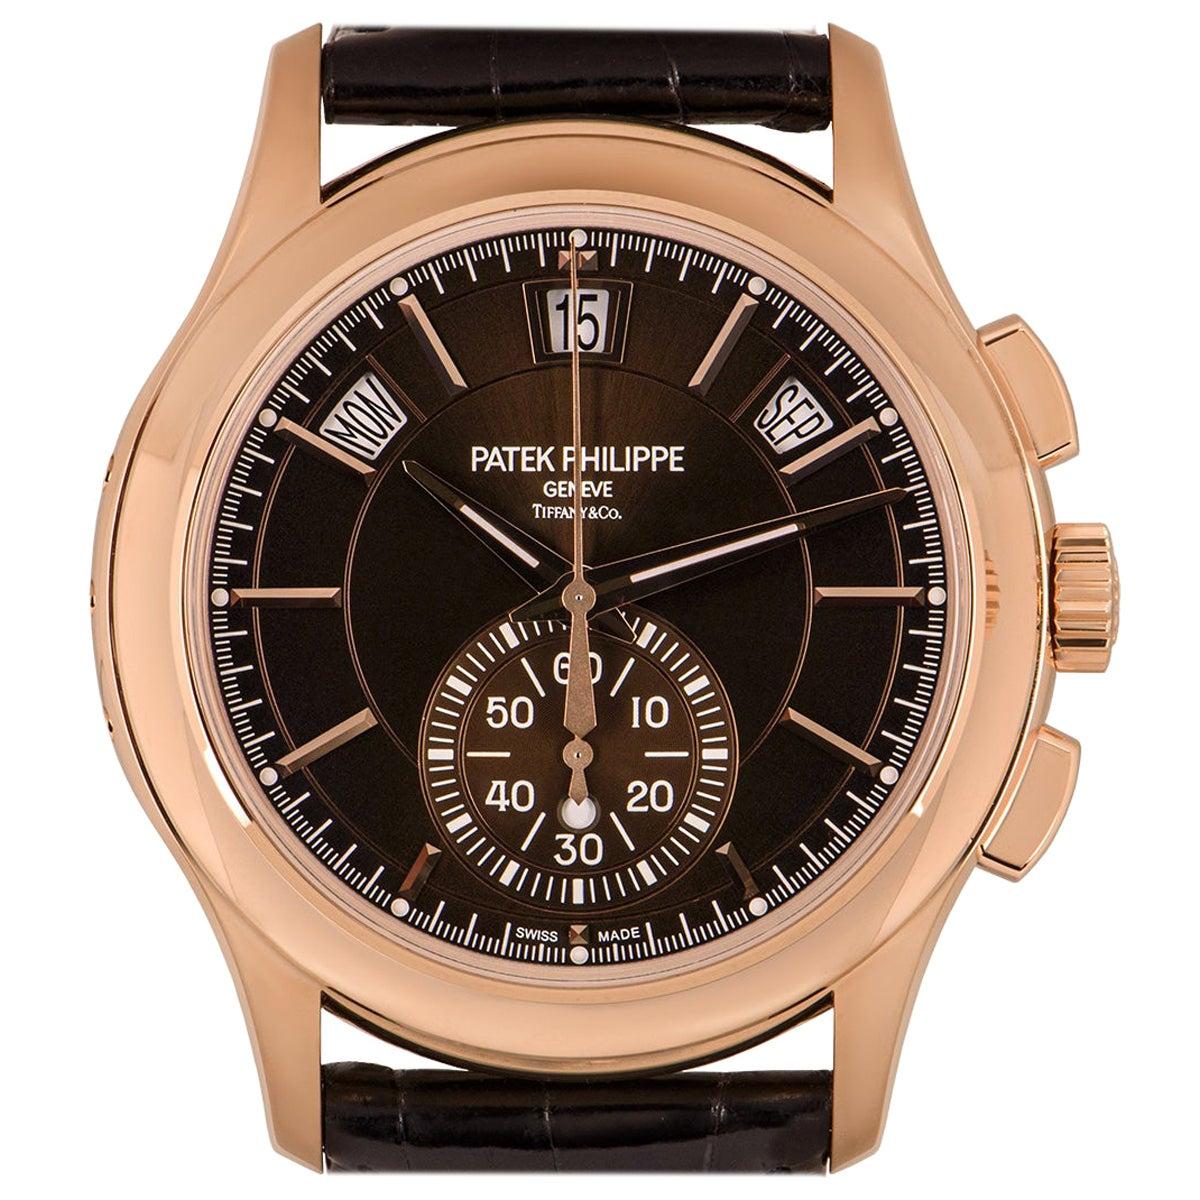 Patek Philippe Unworn Complications Annual Calendar Tiffany & Co. Dial 5905R-001